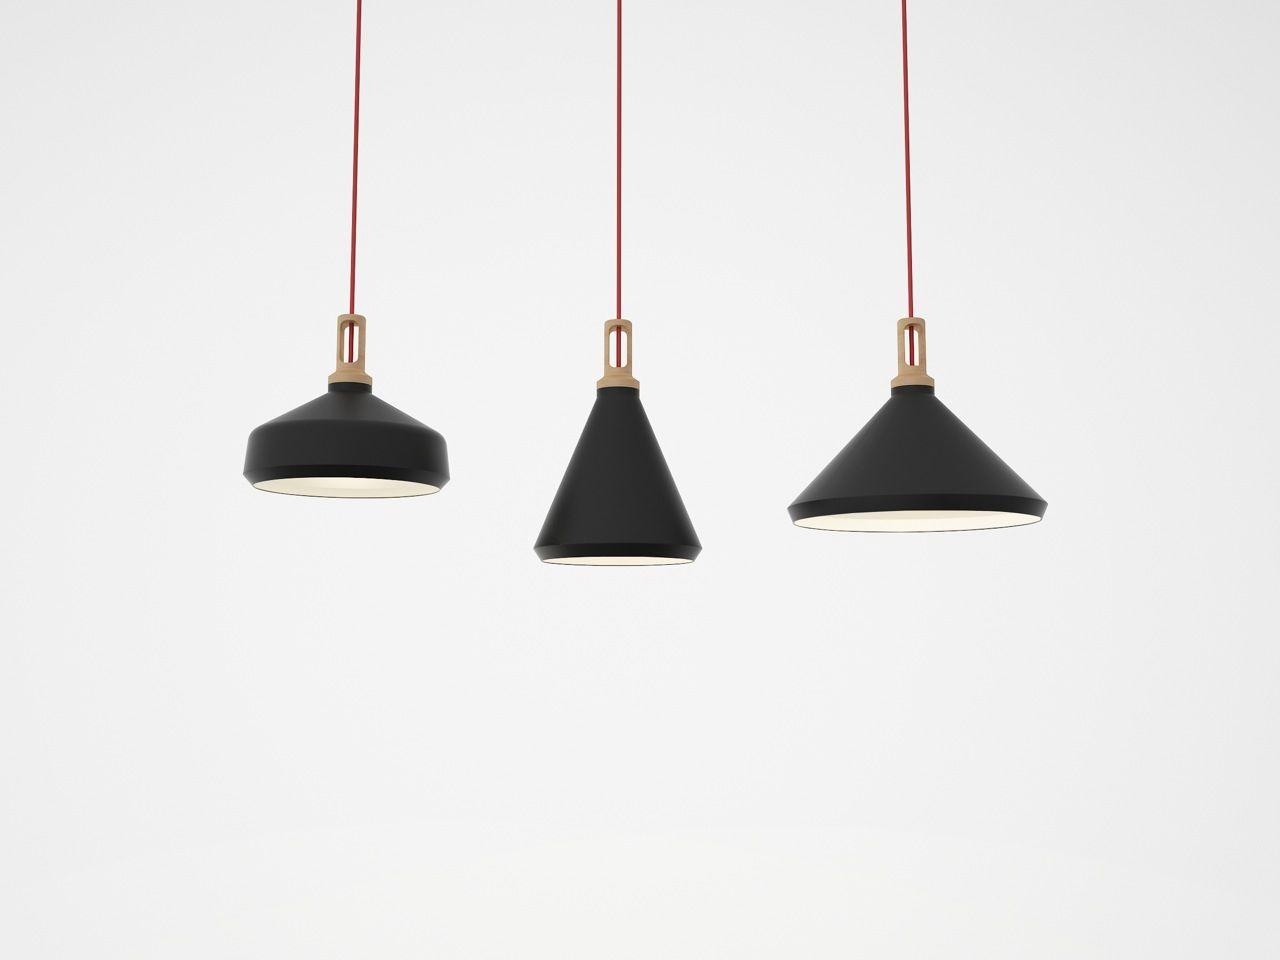 Pendant Lights By Paul Crofts Lighting Ideas